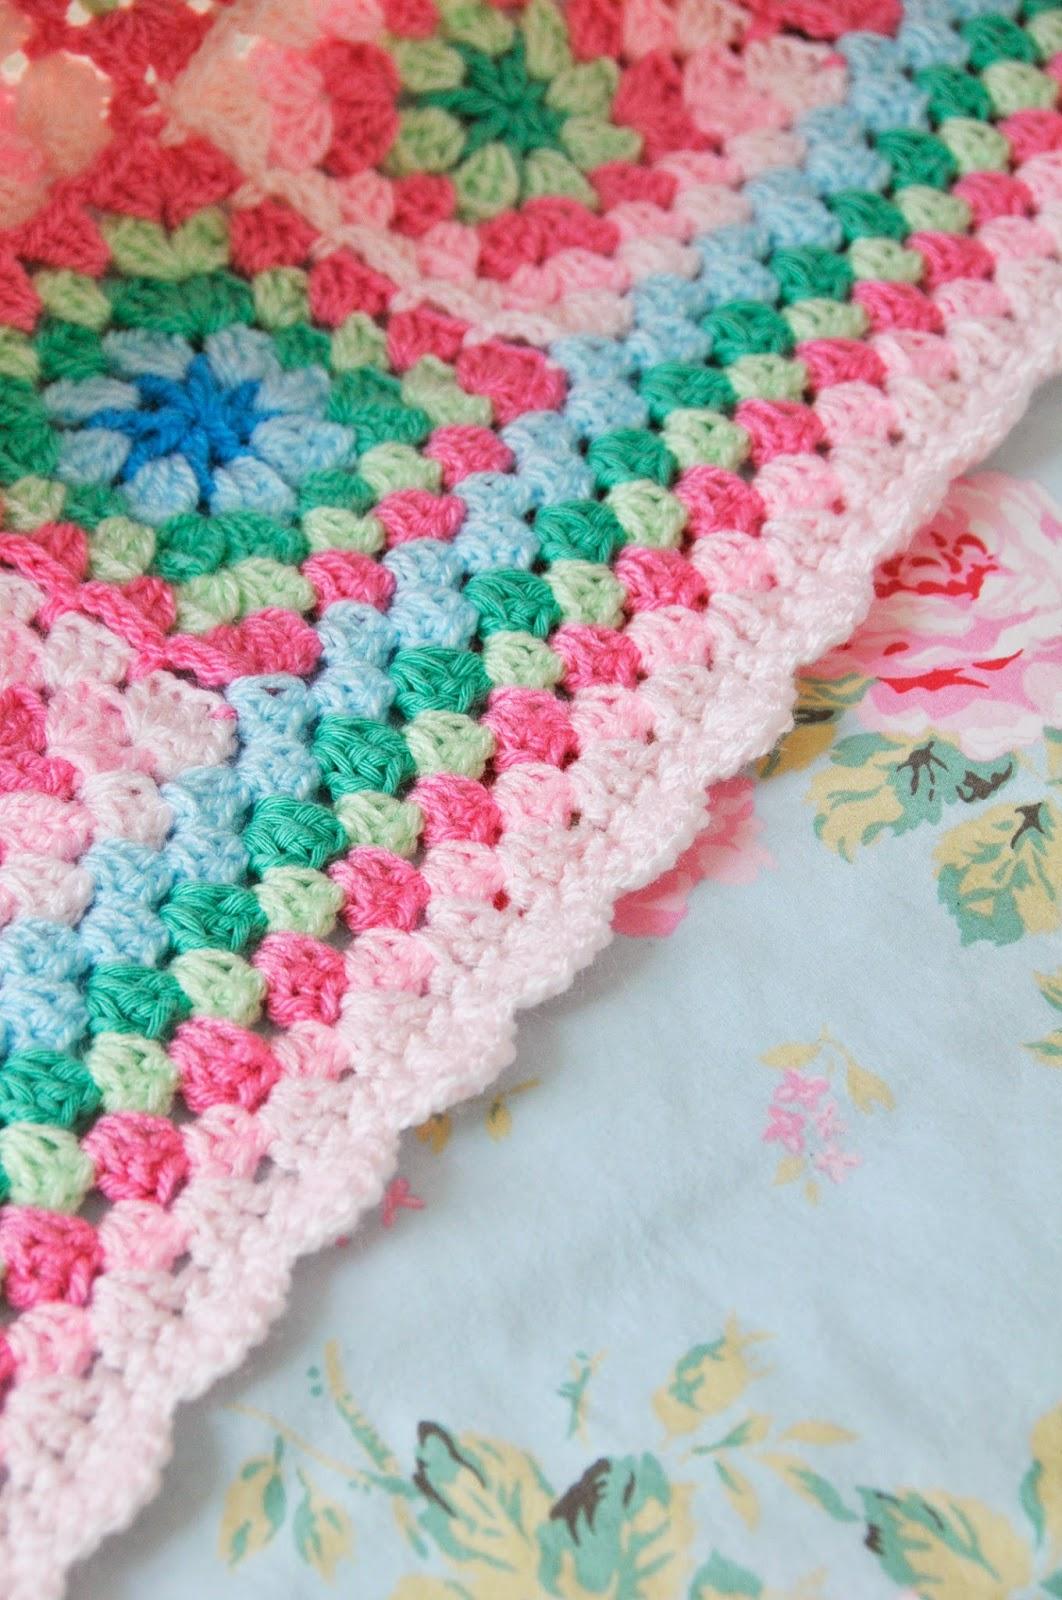 Helen Philipps: Marshmallow Blanket